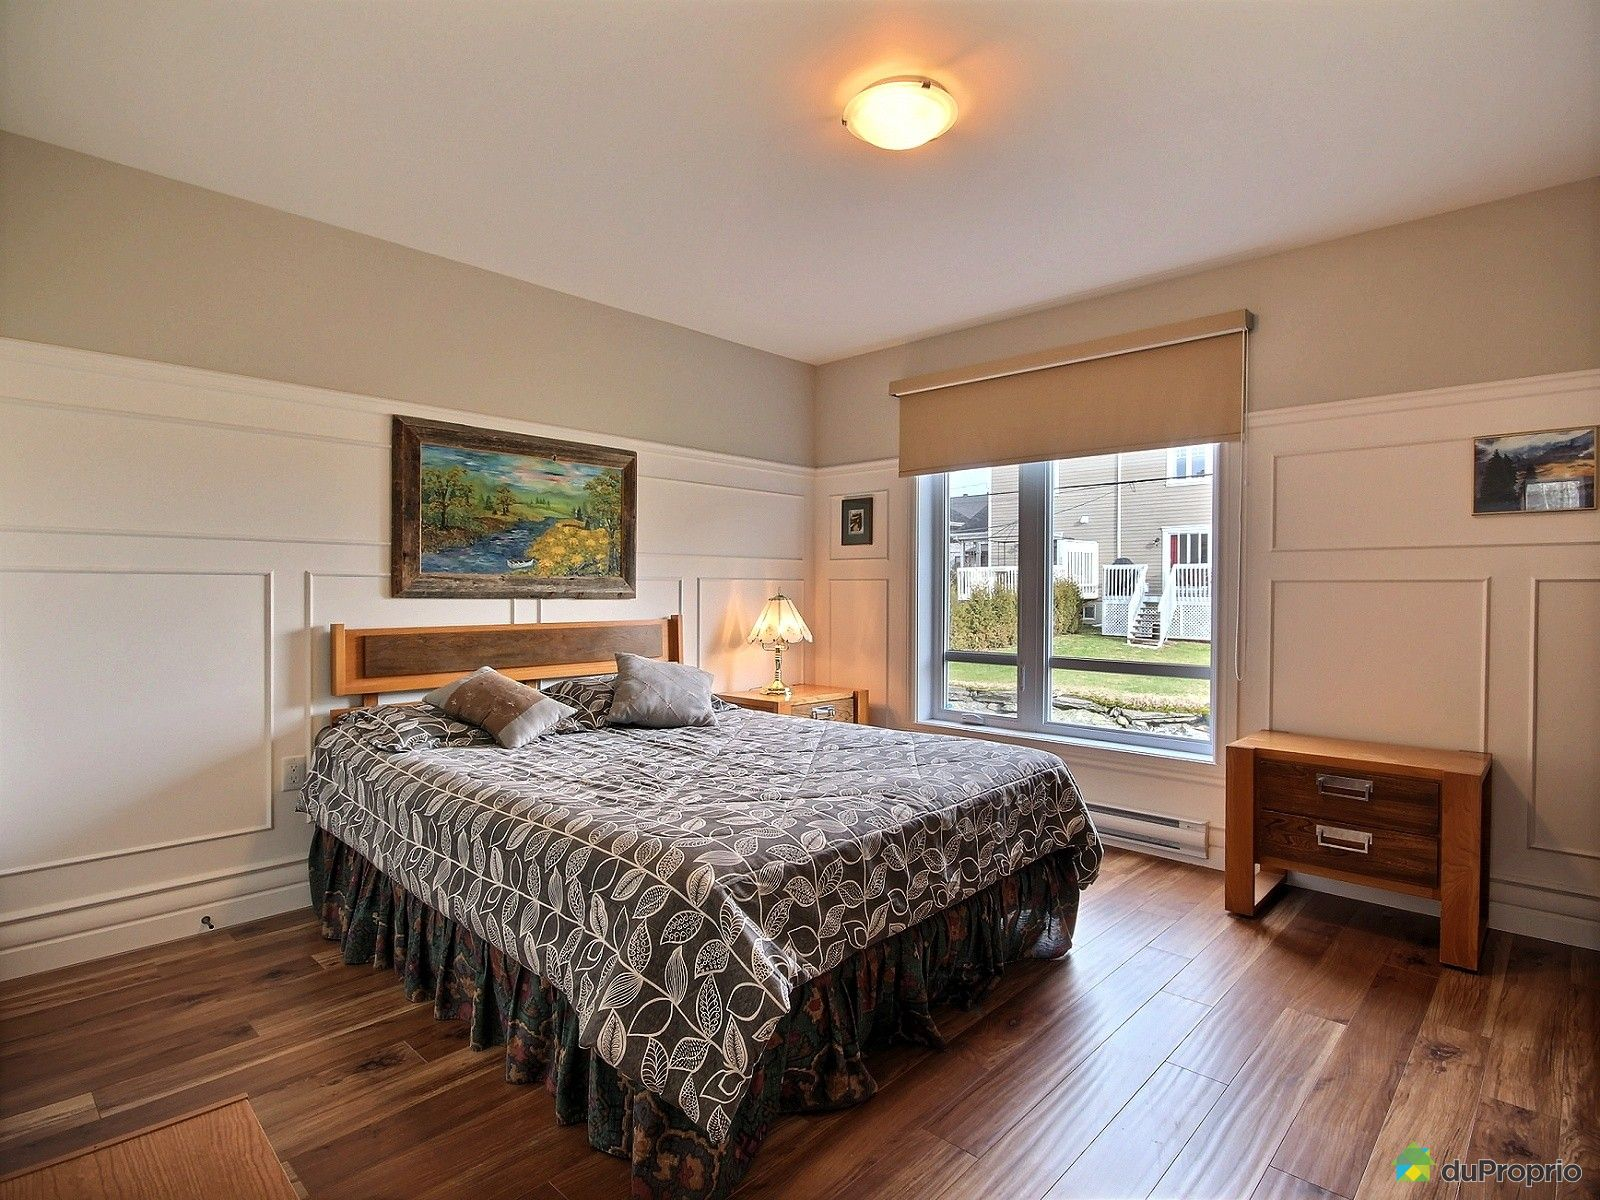 Condo  vendre Sherbrooke 1707 boulevard du MiVallon immobilier Qubec  DuProprio  664189